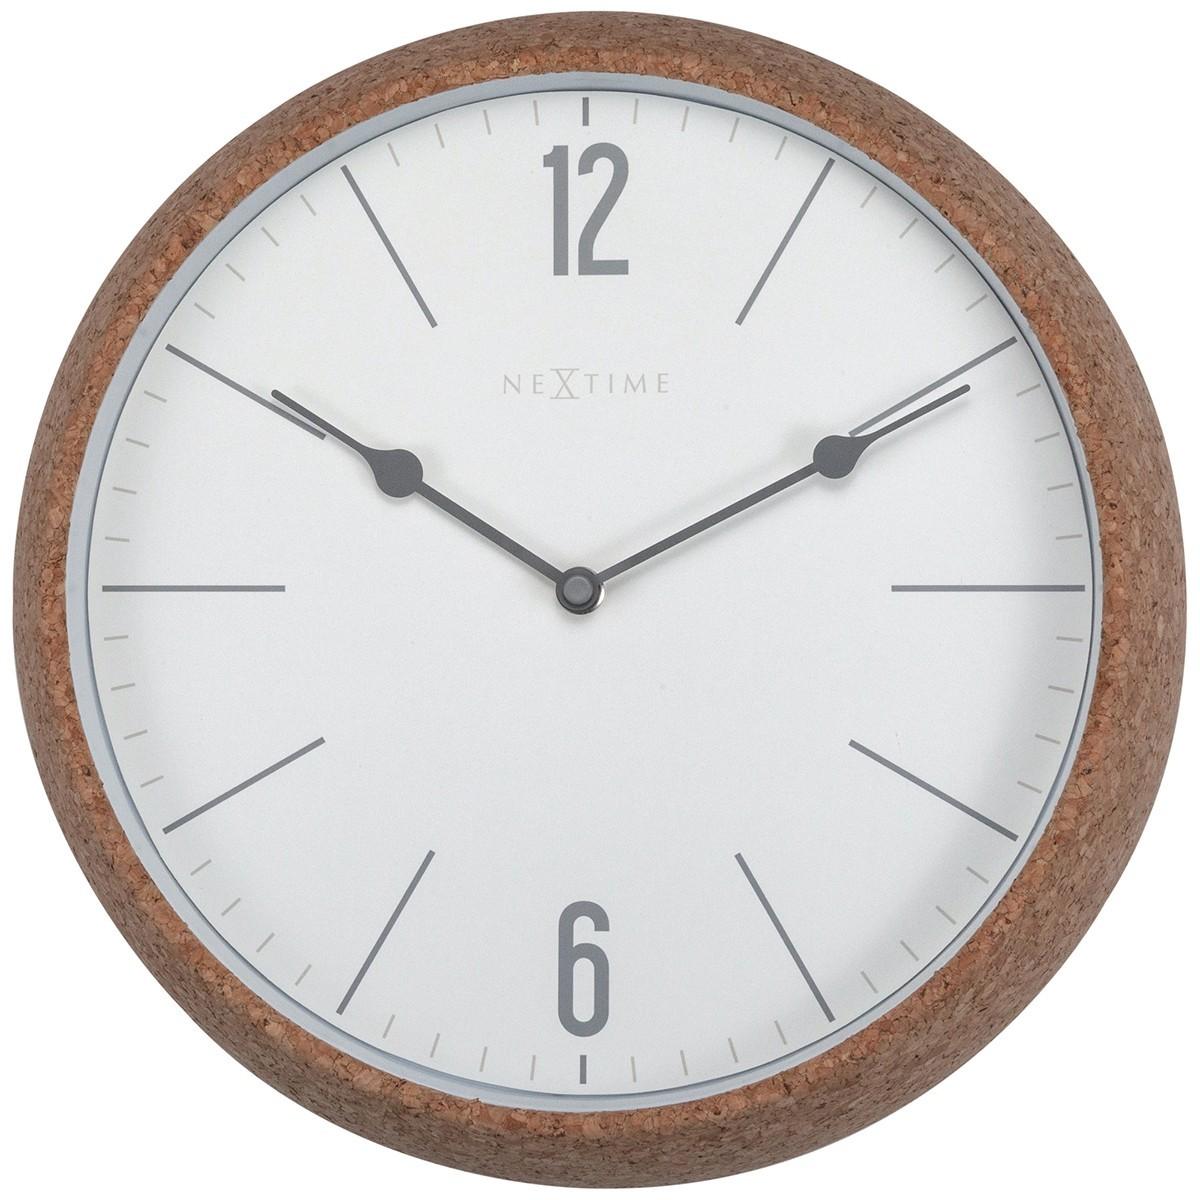 NeXtime Cork Frame Round Wall Clock, 30cm, White